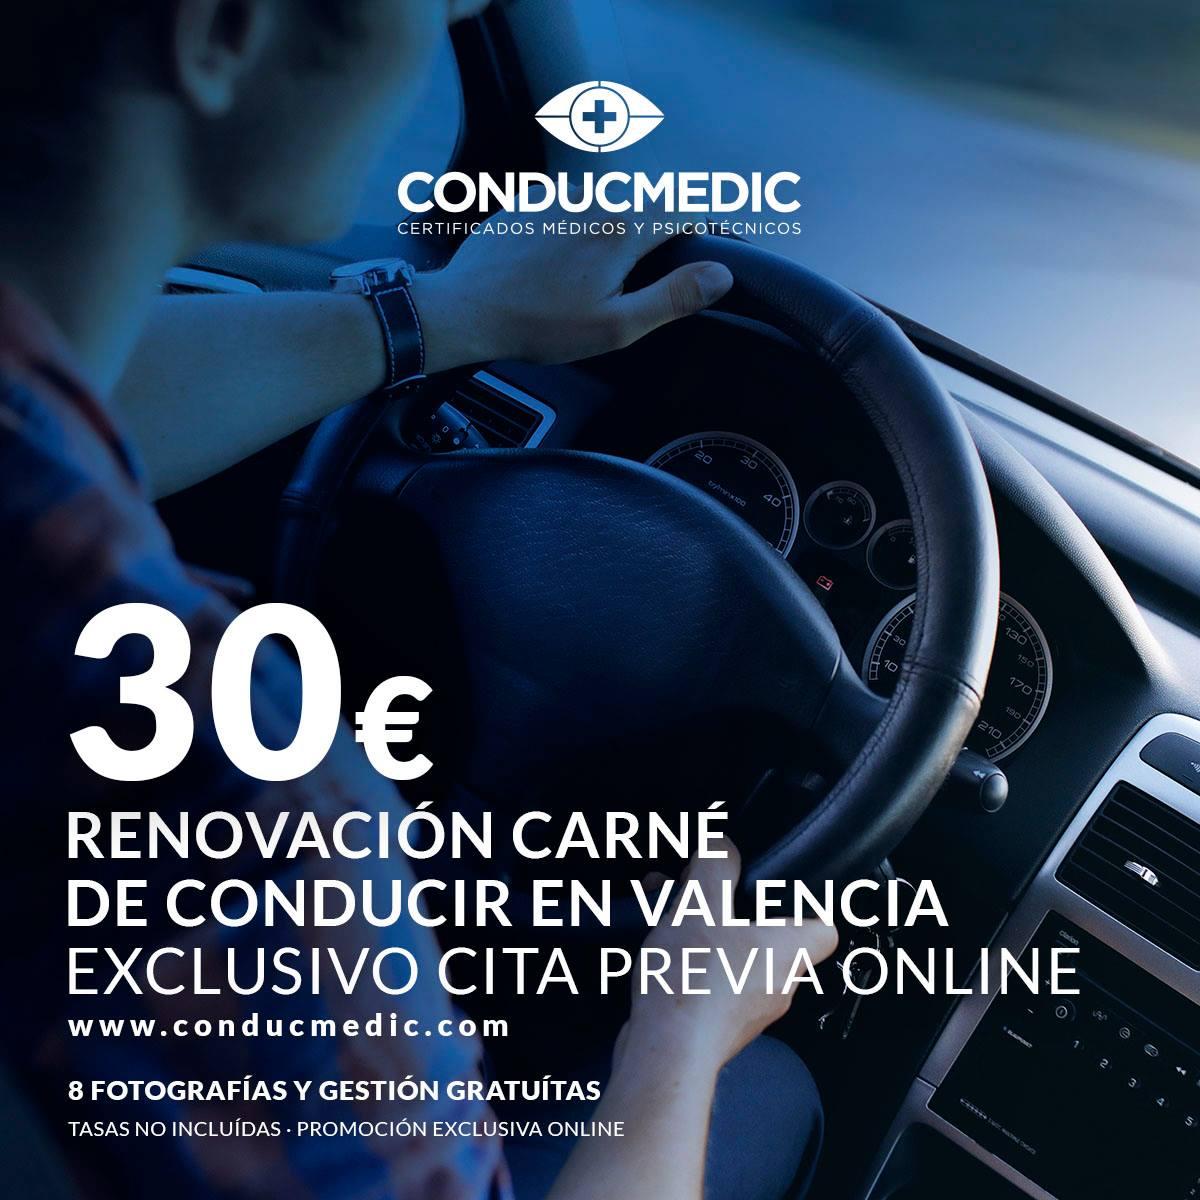 Cita medica online valencia